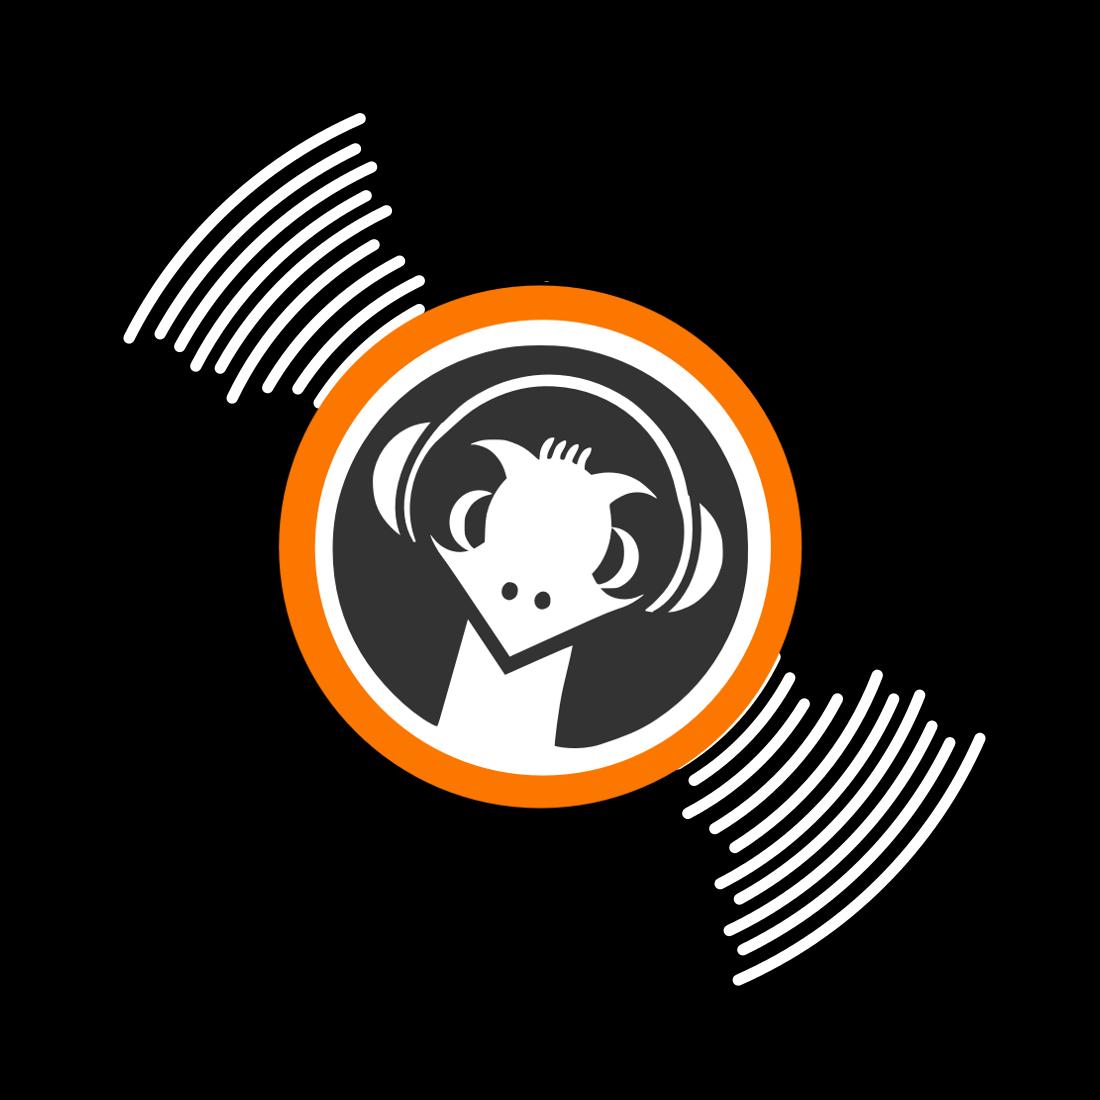 [Le consortium des artistes libres] Seraphine - OST